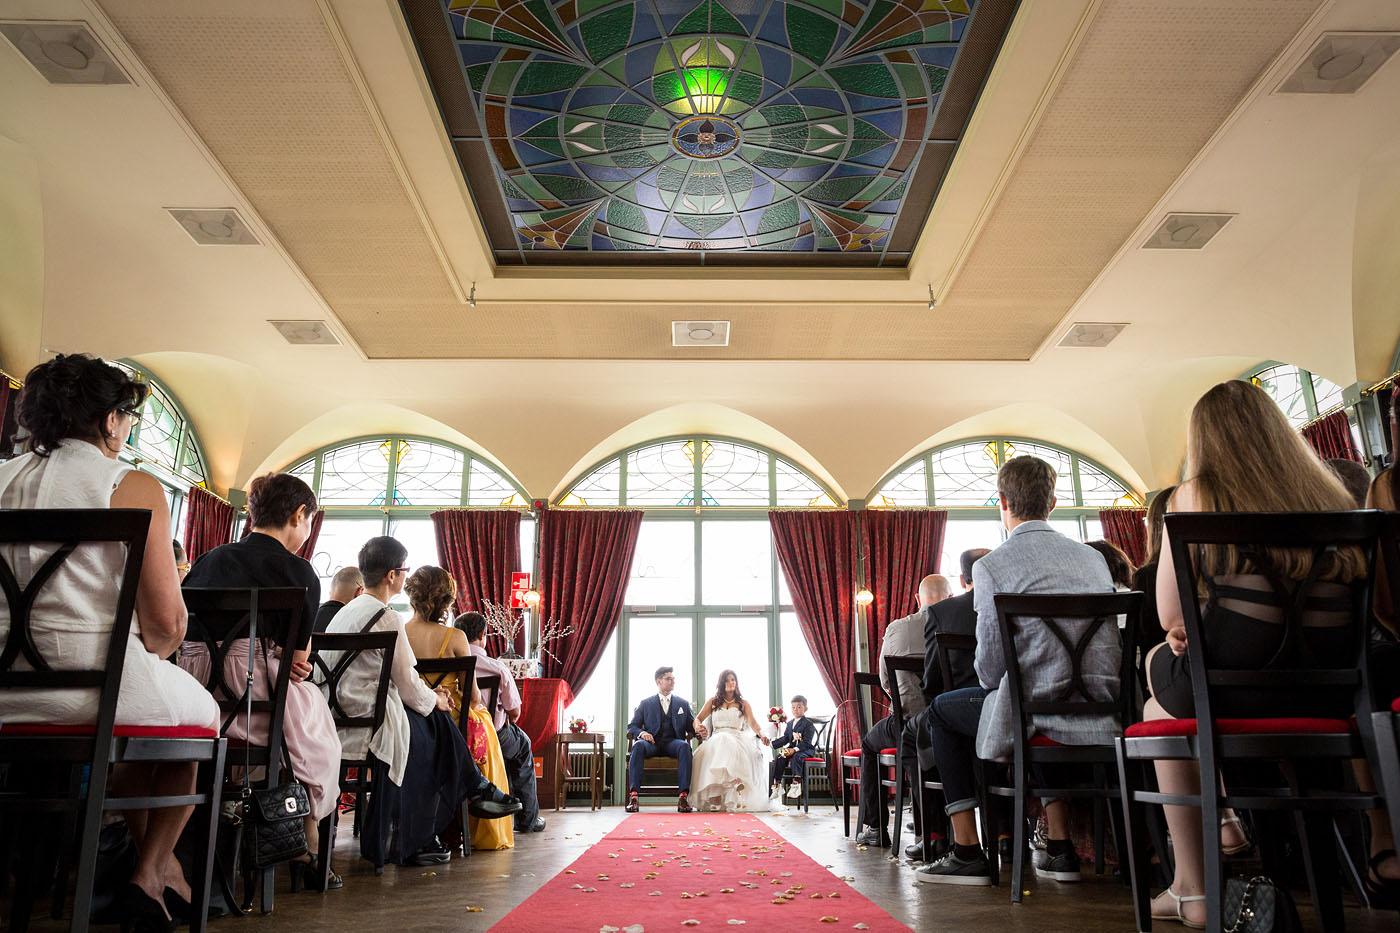 bruiloft-wedding-trouwen-fotograaf-chinees-bobhersbach-rotterdam-videograaf-zalmhuis